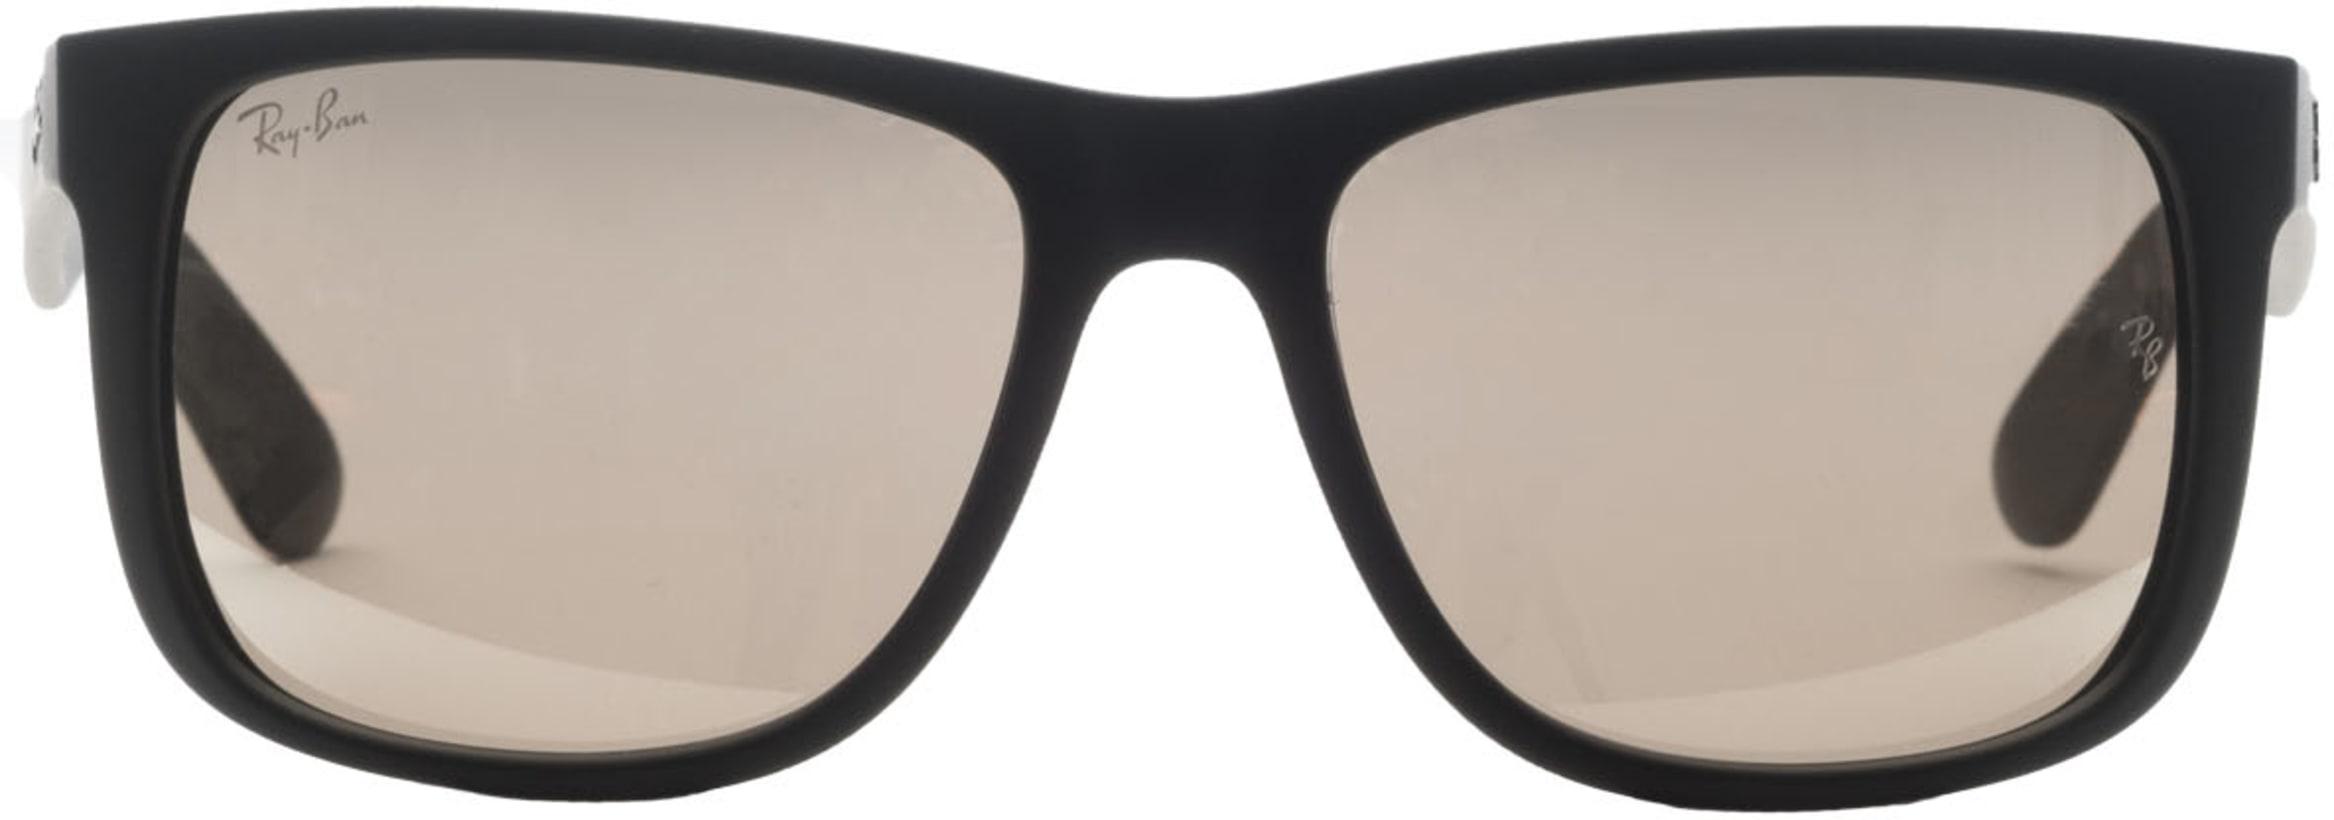 4f3041fdad Ray-Ban  Justin Color Mix Sunglasses - Black Gold Mirror